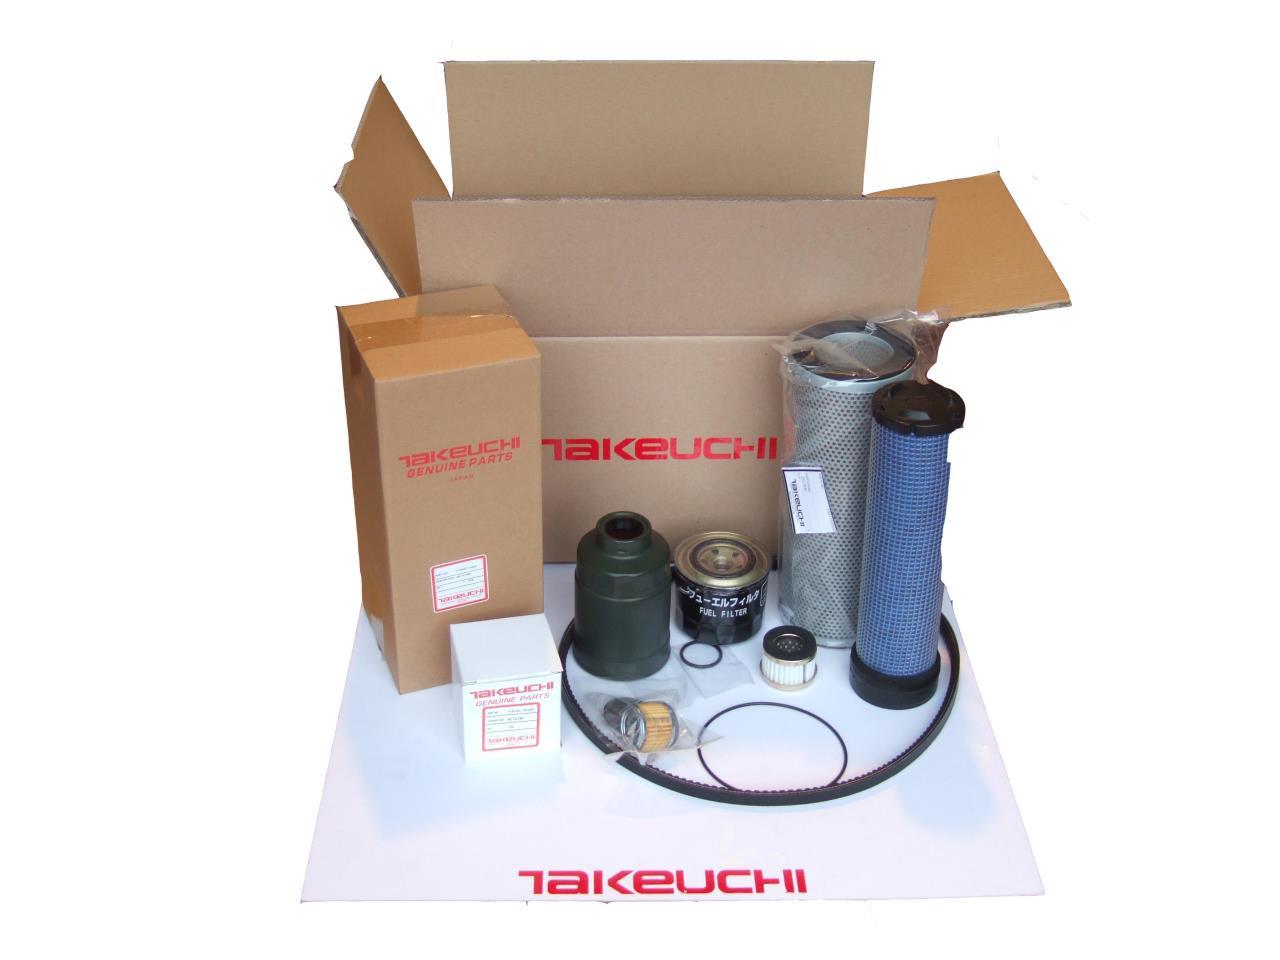 Takeuchi TB250 filtersæt